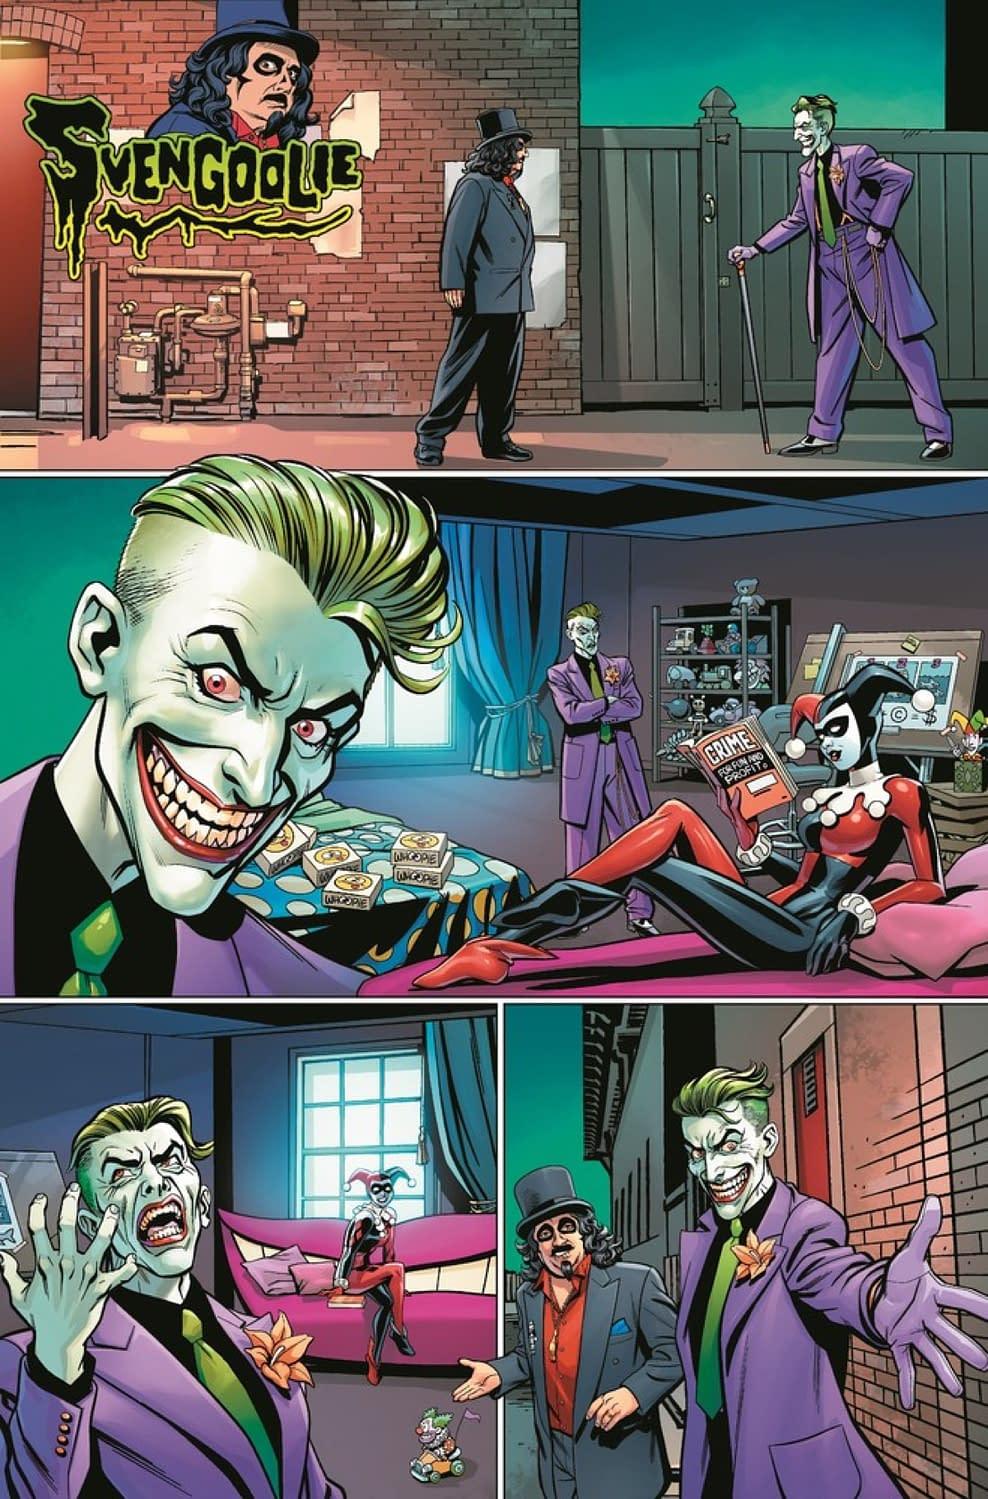 Dan Didio to Write Svengoolie Crossover for DC's October Comics